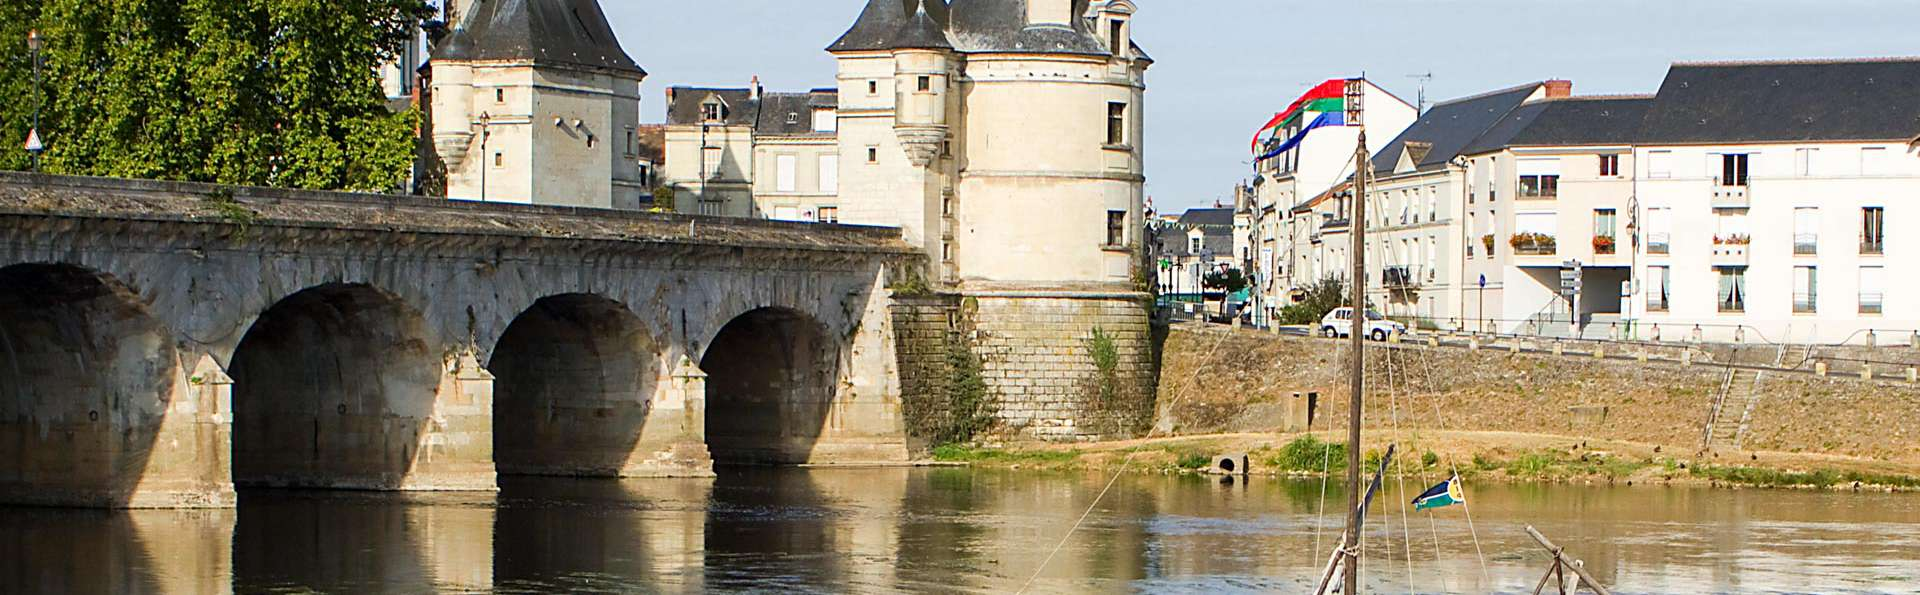 Château Laroche-Ploquin - EDIT_DESTINATION_02.jpg